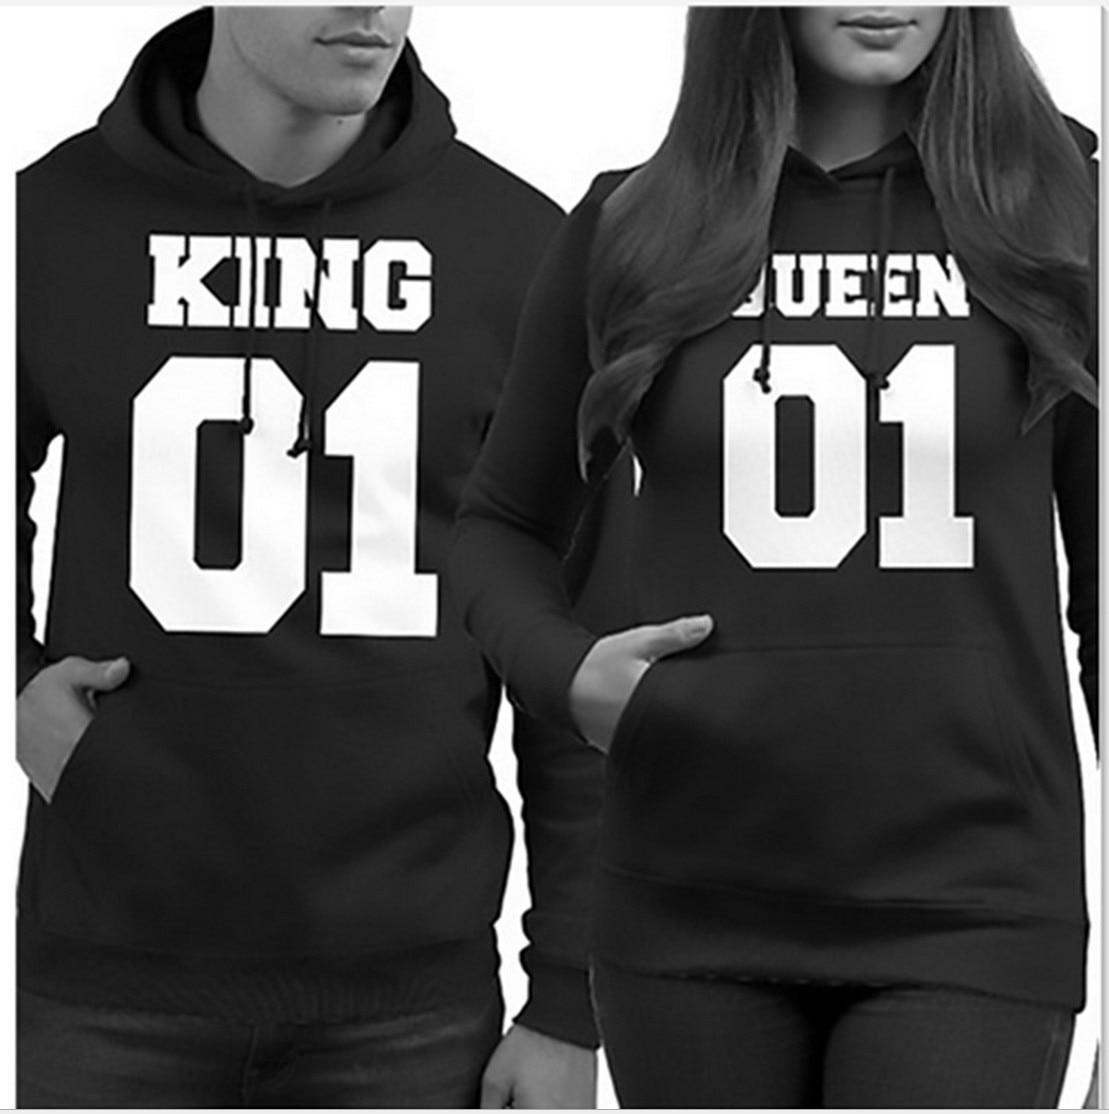 King Queen Sweatshirt Women Valentine 39 s Day Hoodies Rose Love Streetwear Oversized Hoodies Clothing Plus in Hoodies amp Sweatshirts from Women 39 s Clothing